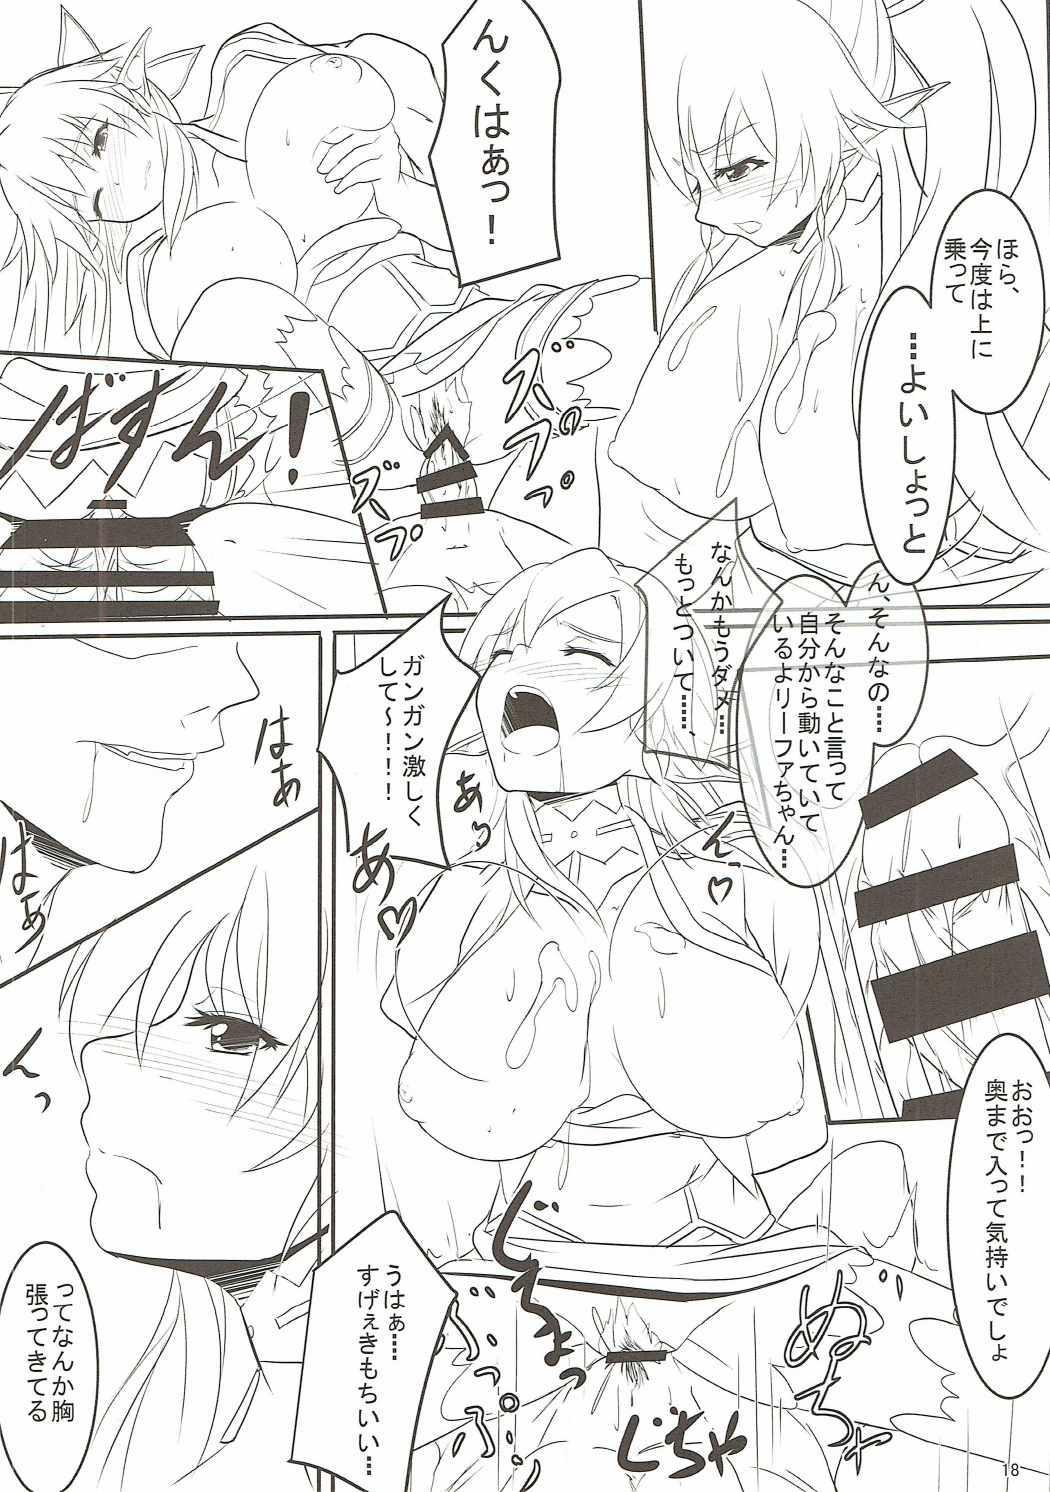 Sexual Desire 16